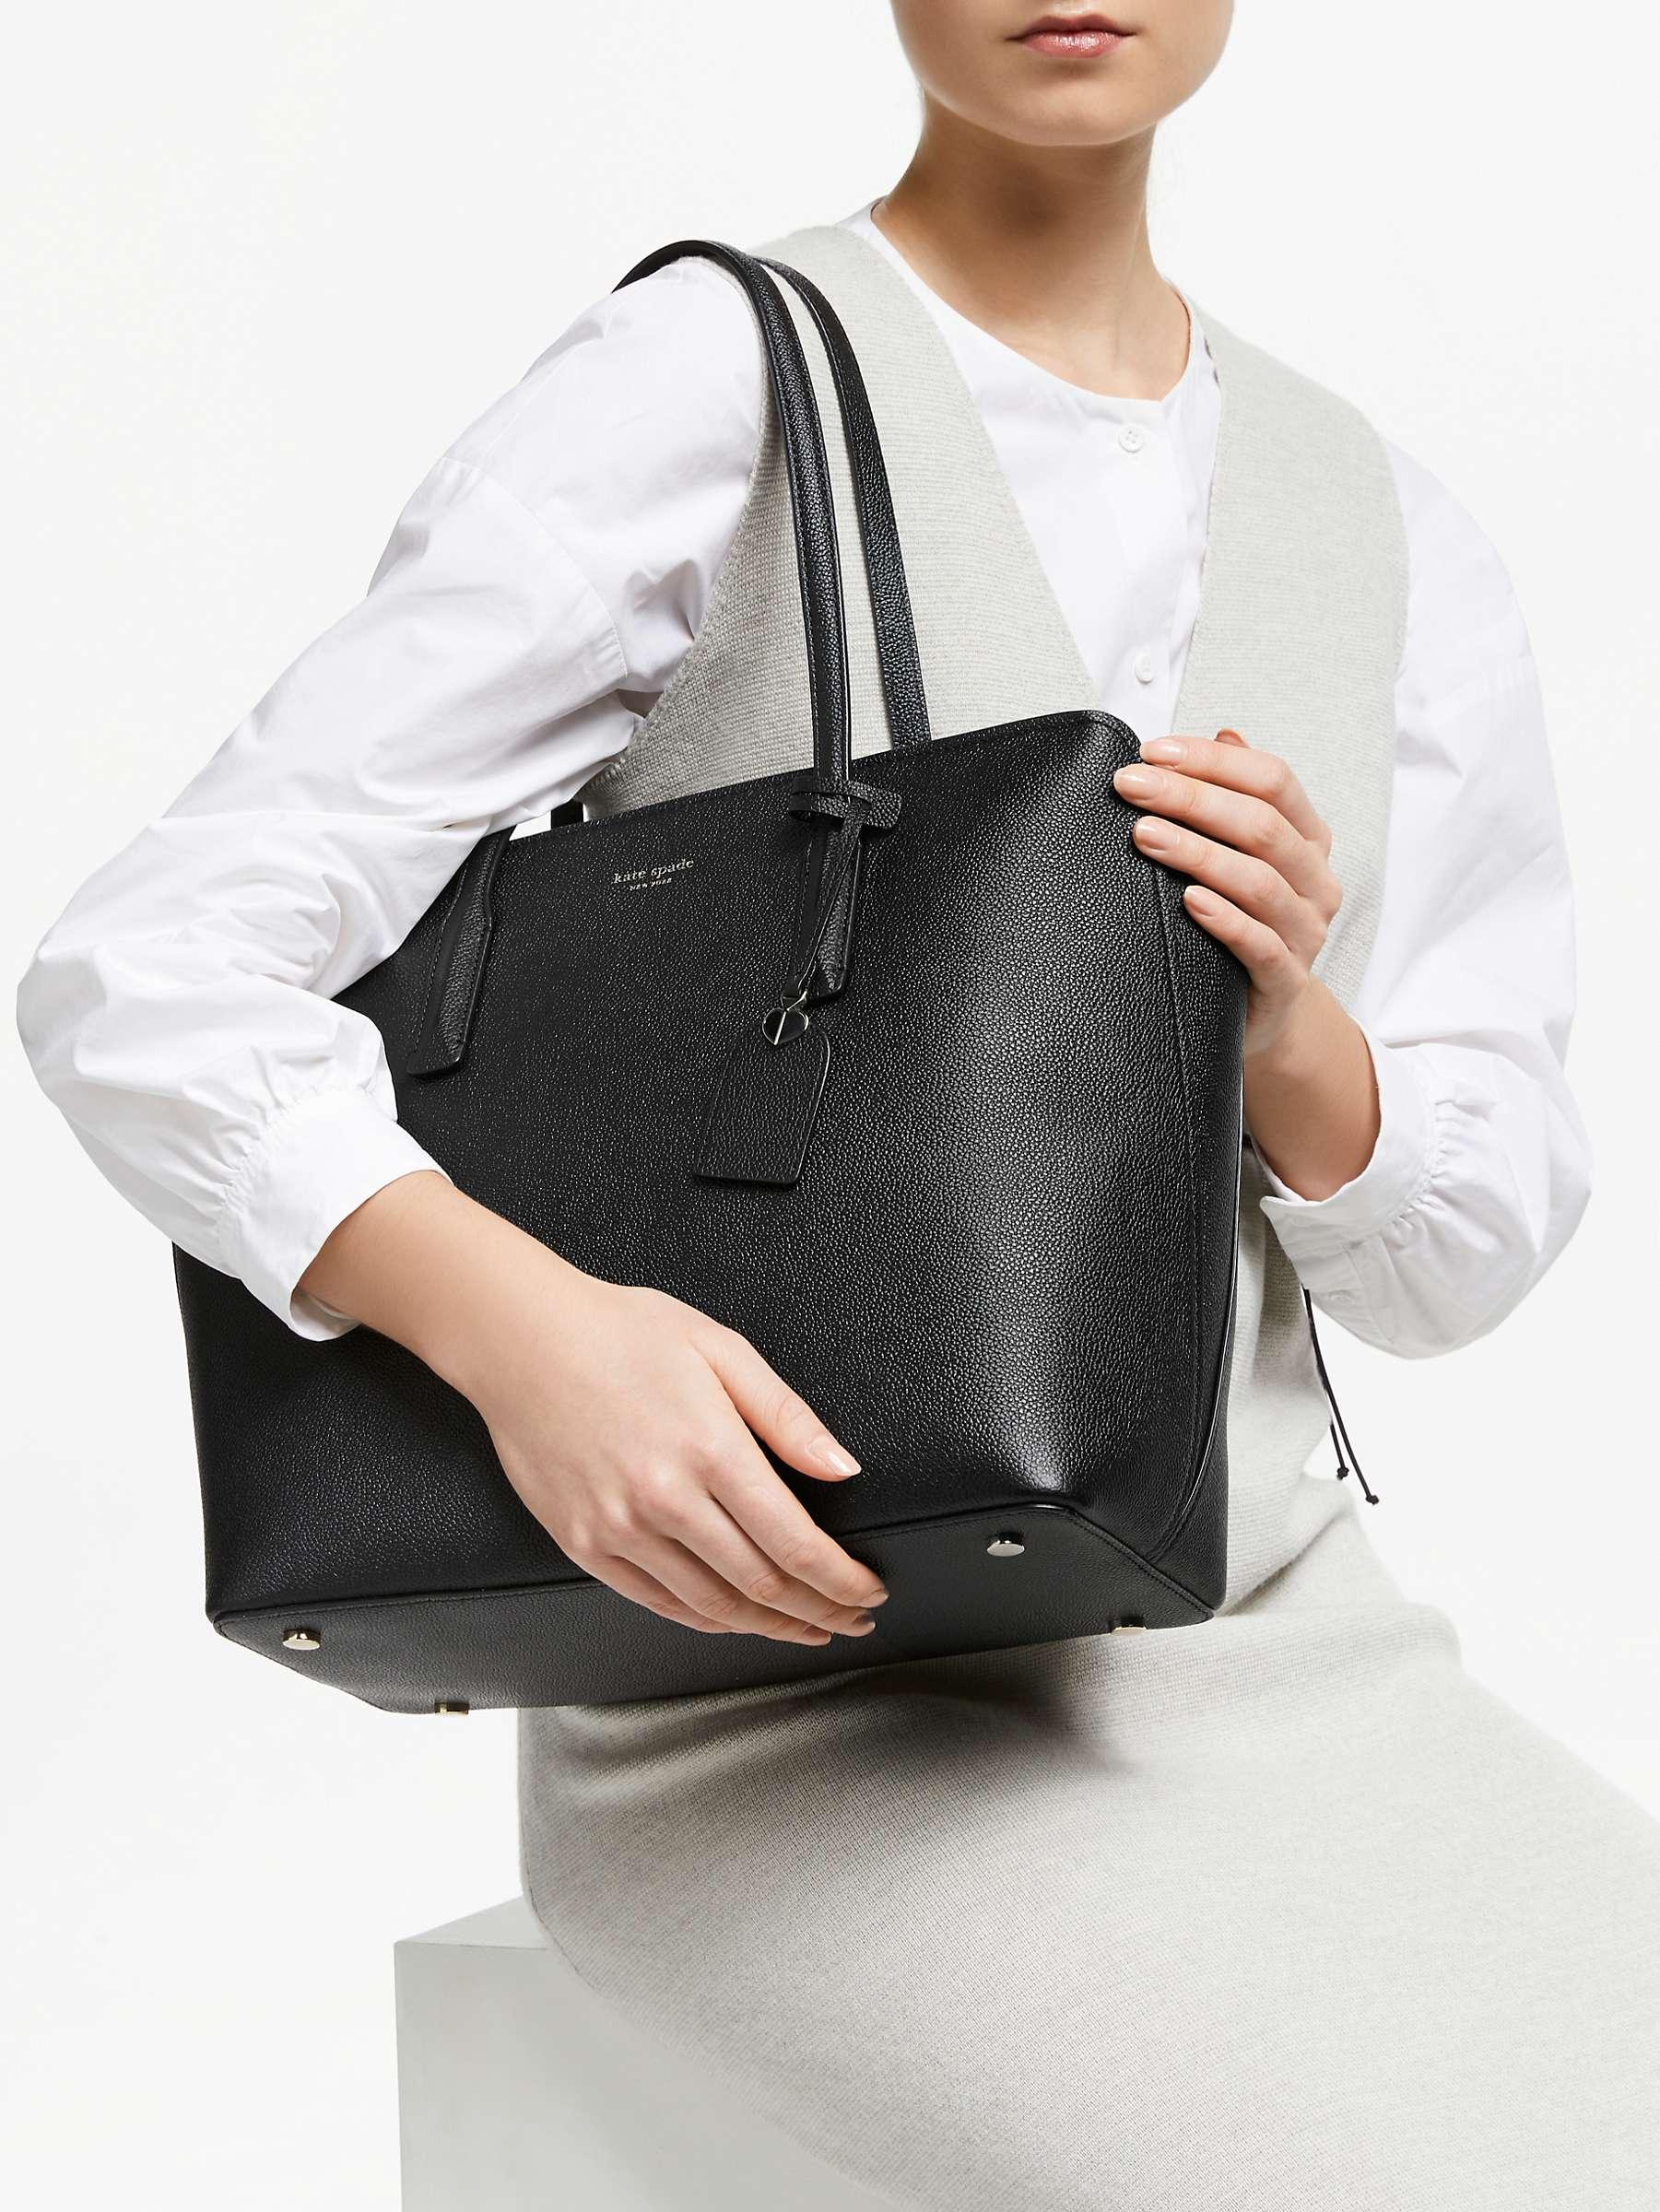 Kate Spade New York Margaux Large Leather Tote Bag Black